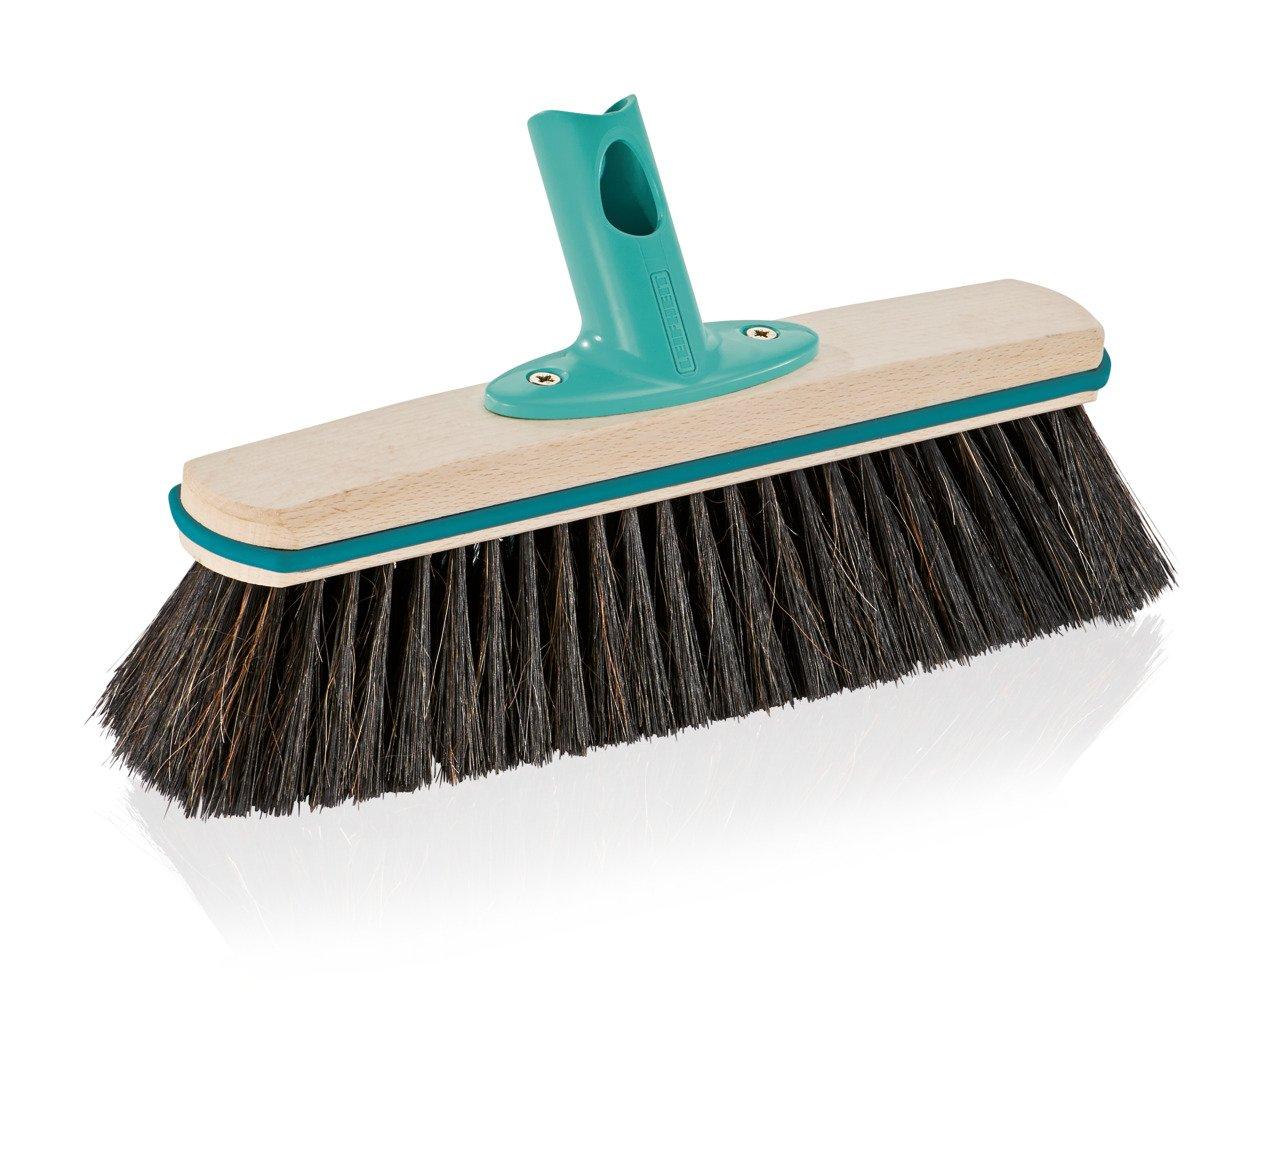 Leifheit Hard Floor Broom Xtra Clean Eco Plus 30 cm, Floor Broom, House Broom, Dustpan Brush, Wood / Mint Green, 45002 by Leifheit (Image #3)